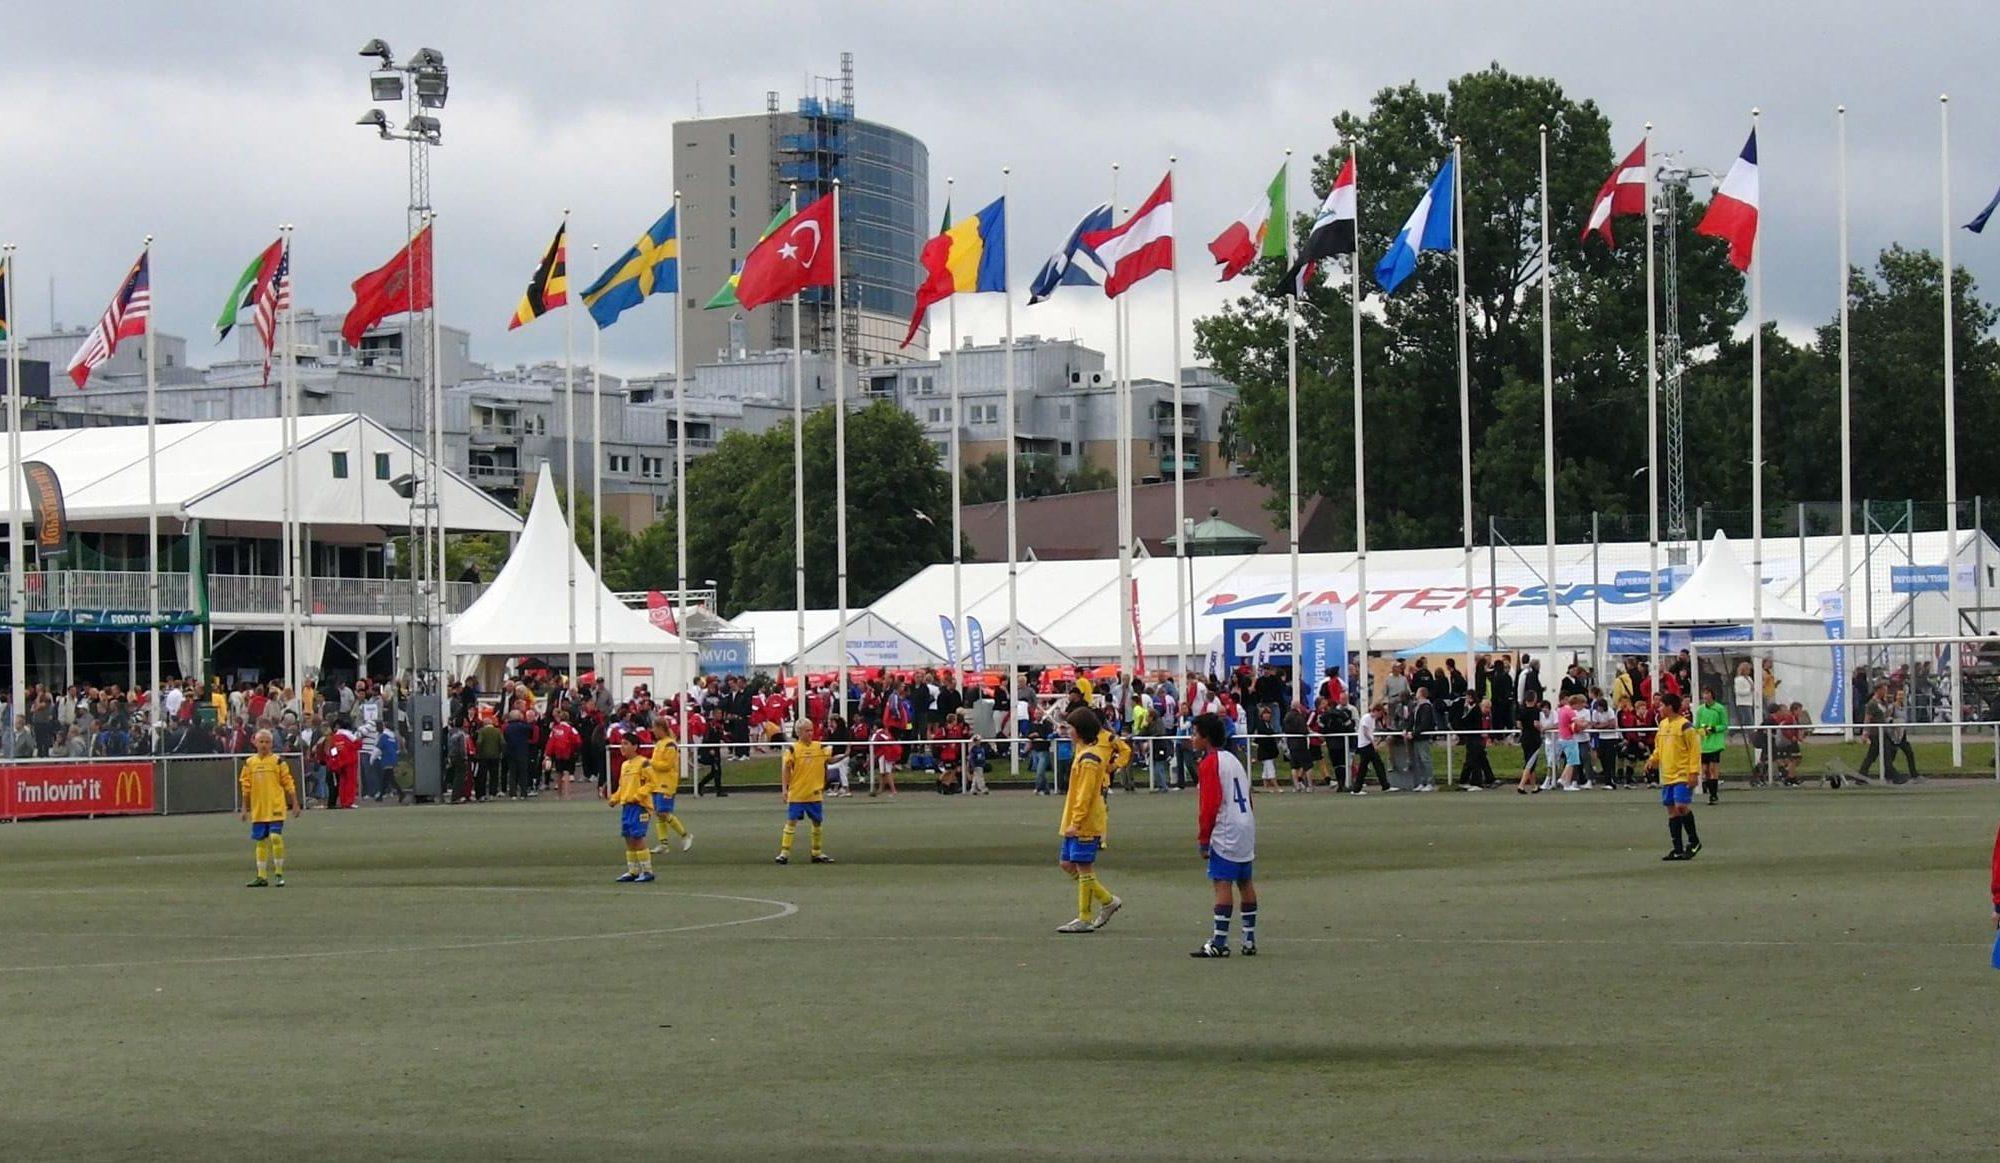 Gothia Cup, Sweden